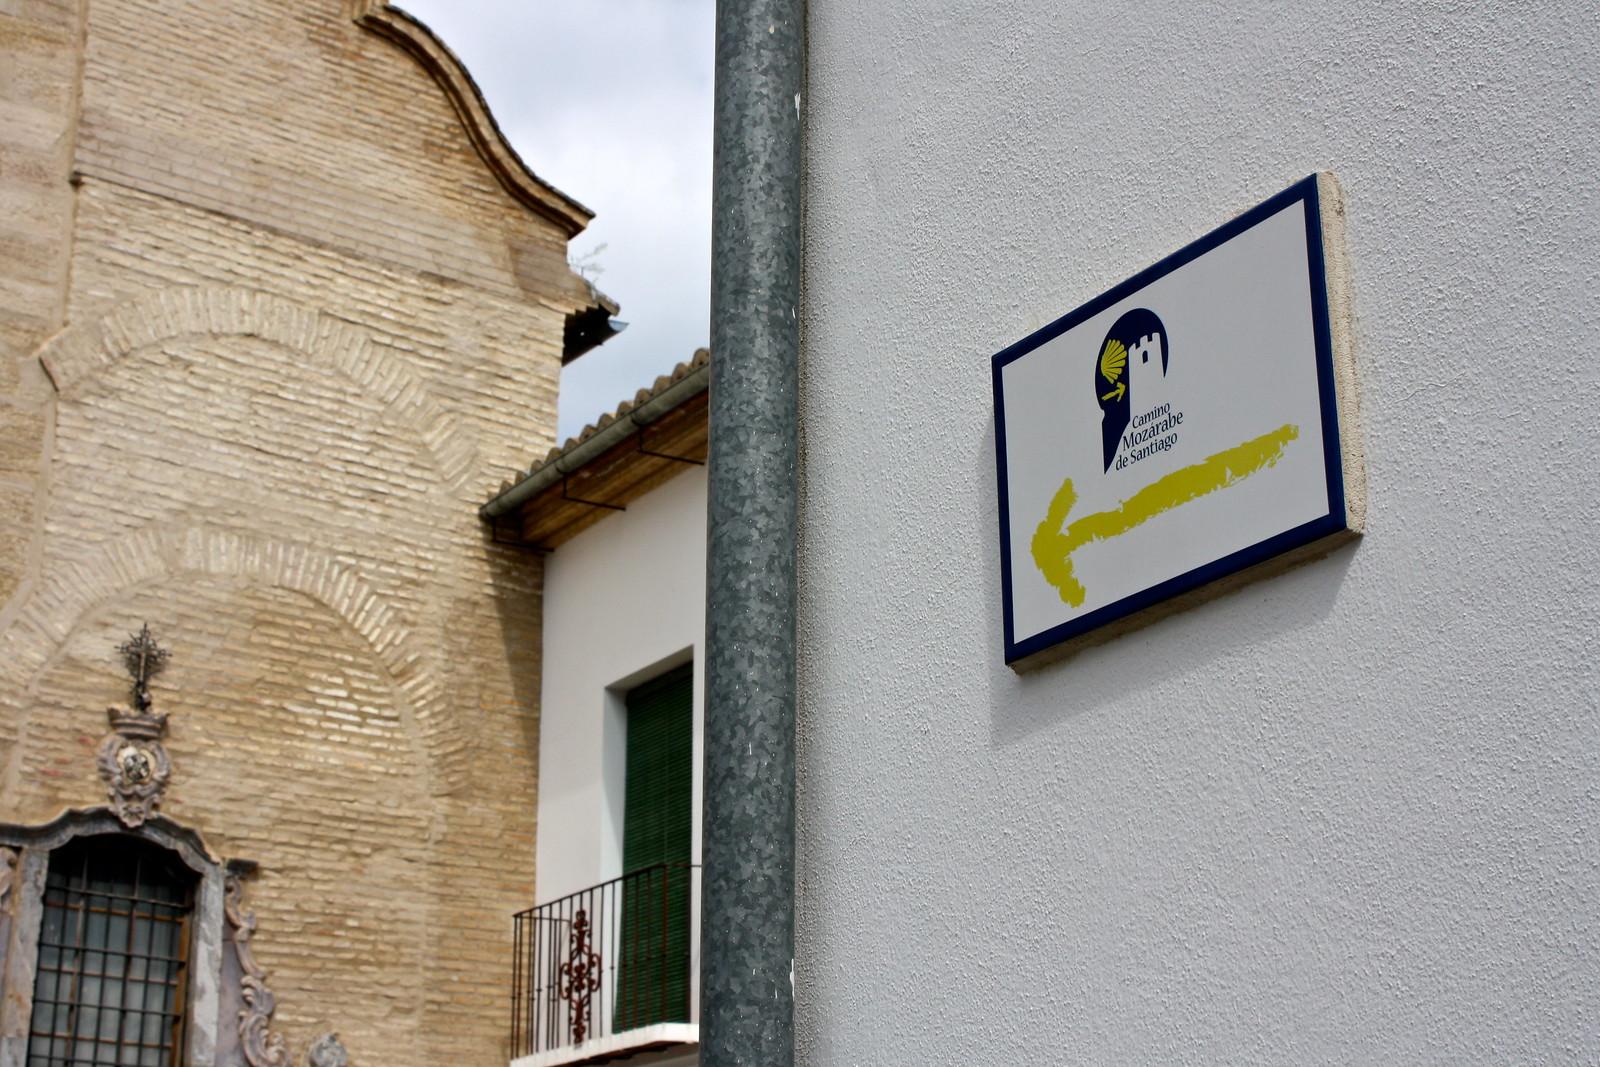 Camino de Santiago in Antequera, Spain